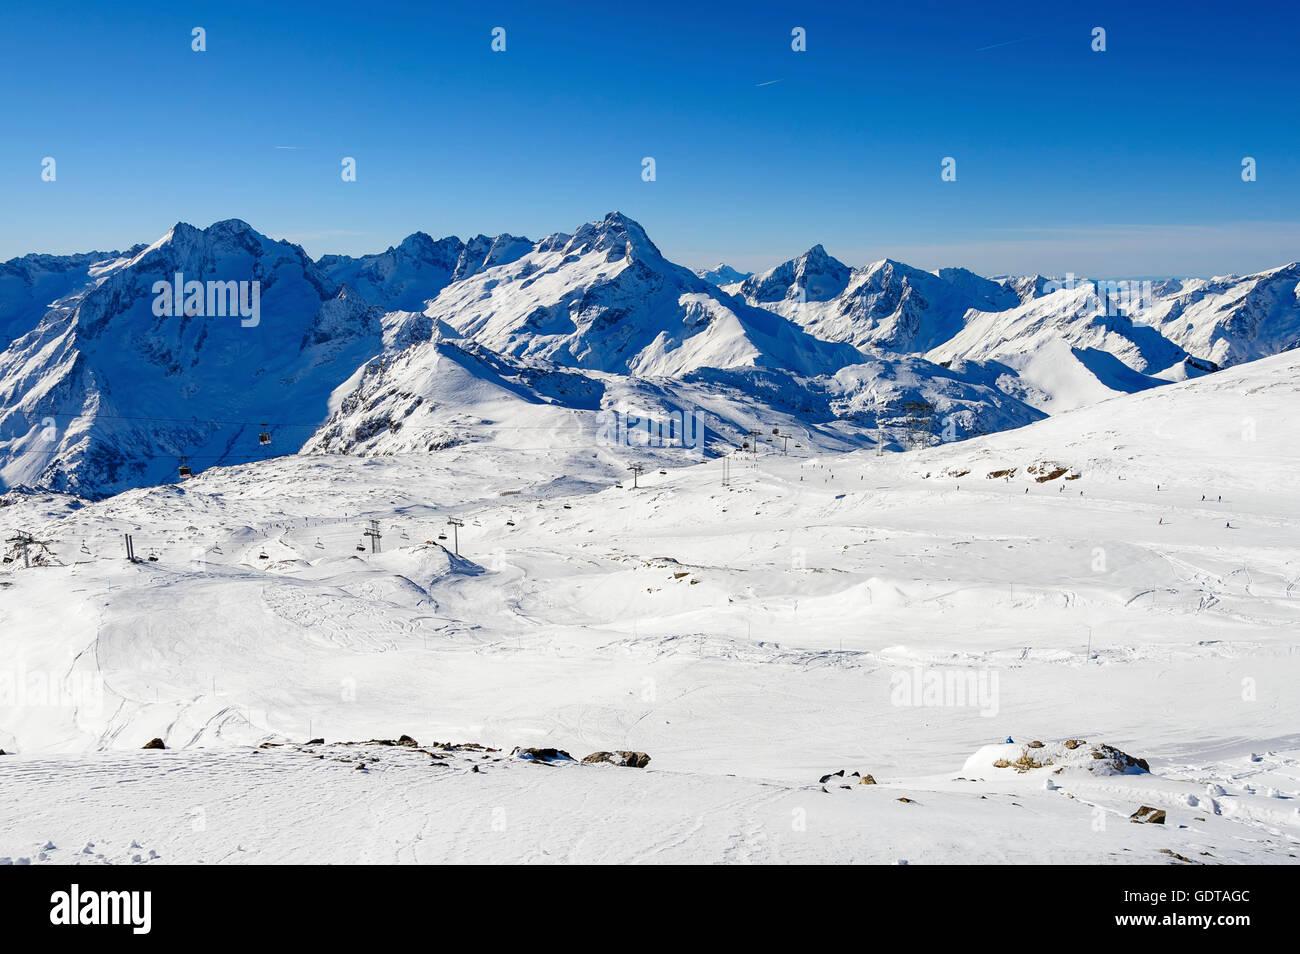 Pistes and ski lifts, ski resort 'Les Deux Alpes, Alps, France - Stock Image